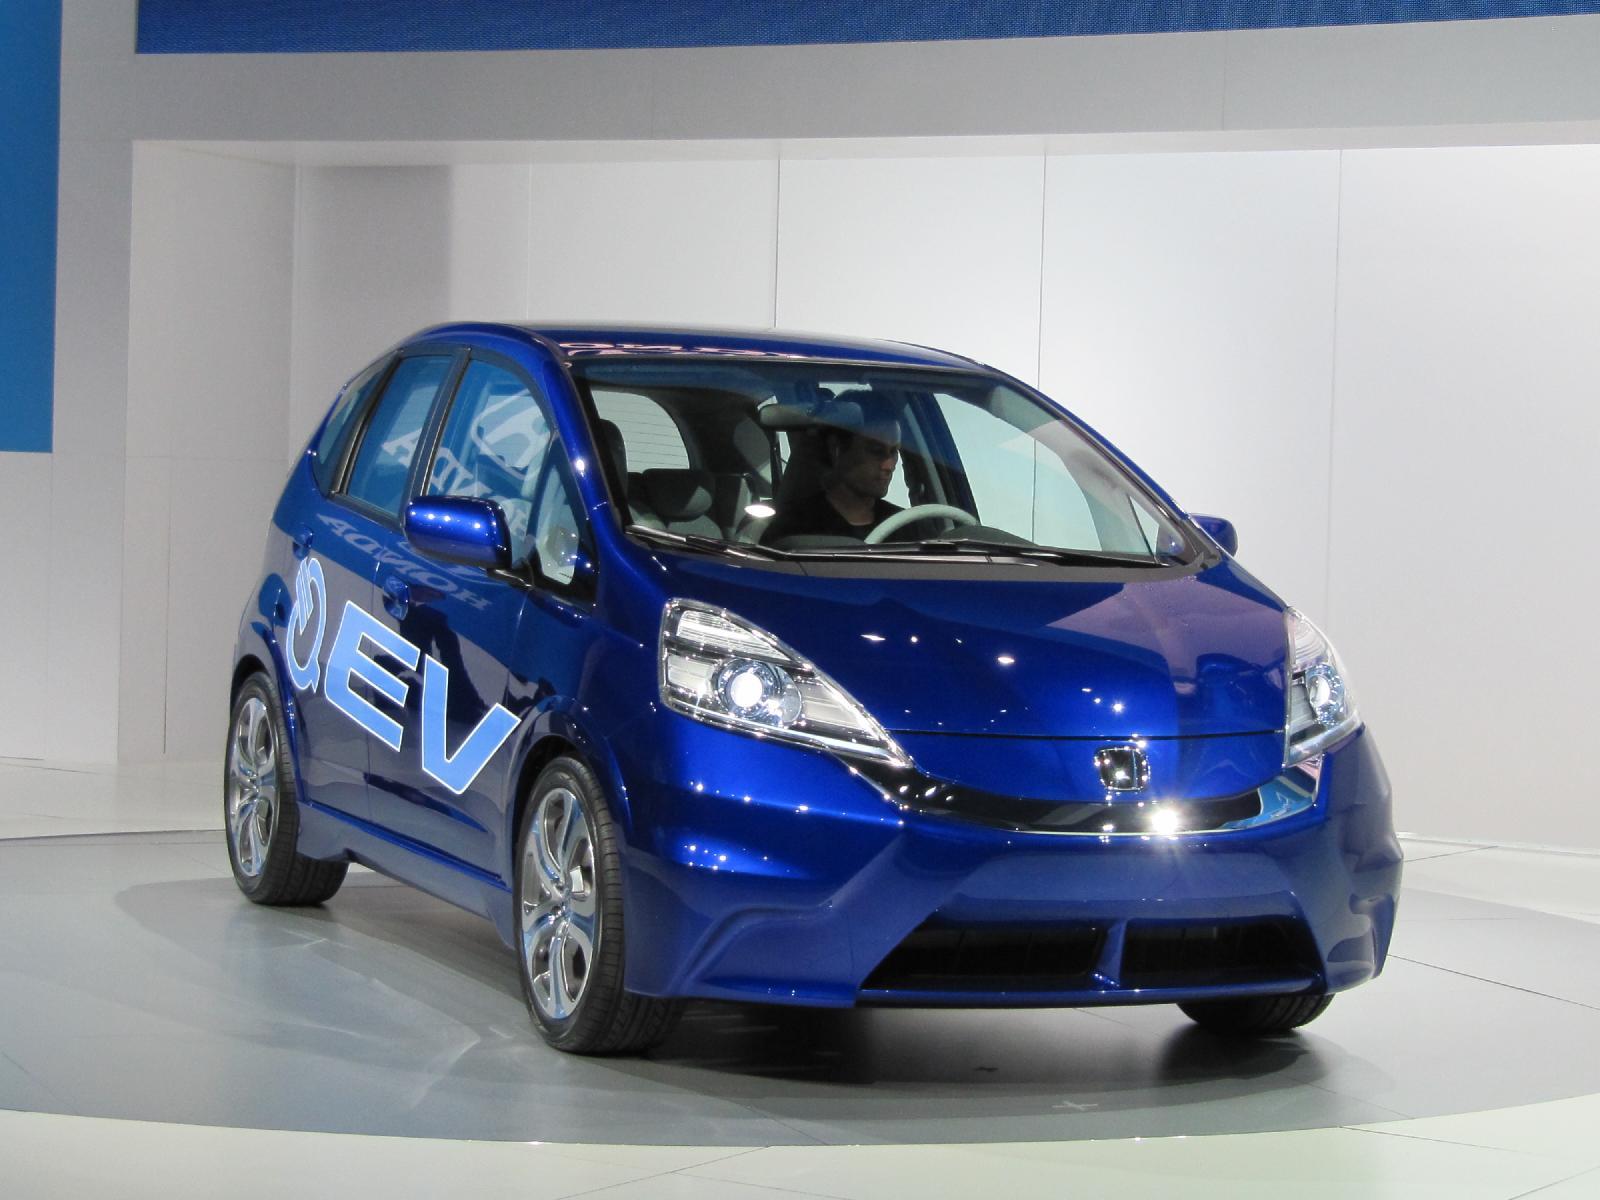 2010 LA Auto Show 2012 Honda Fit Electric Car World Debut